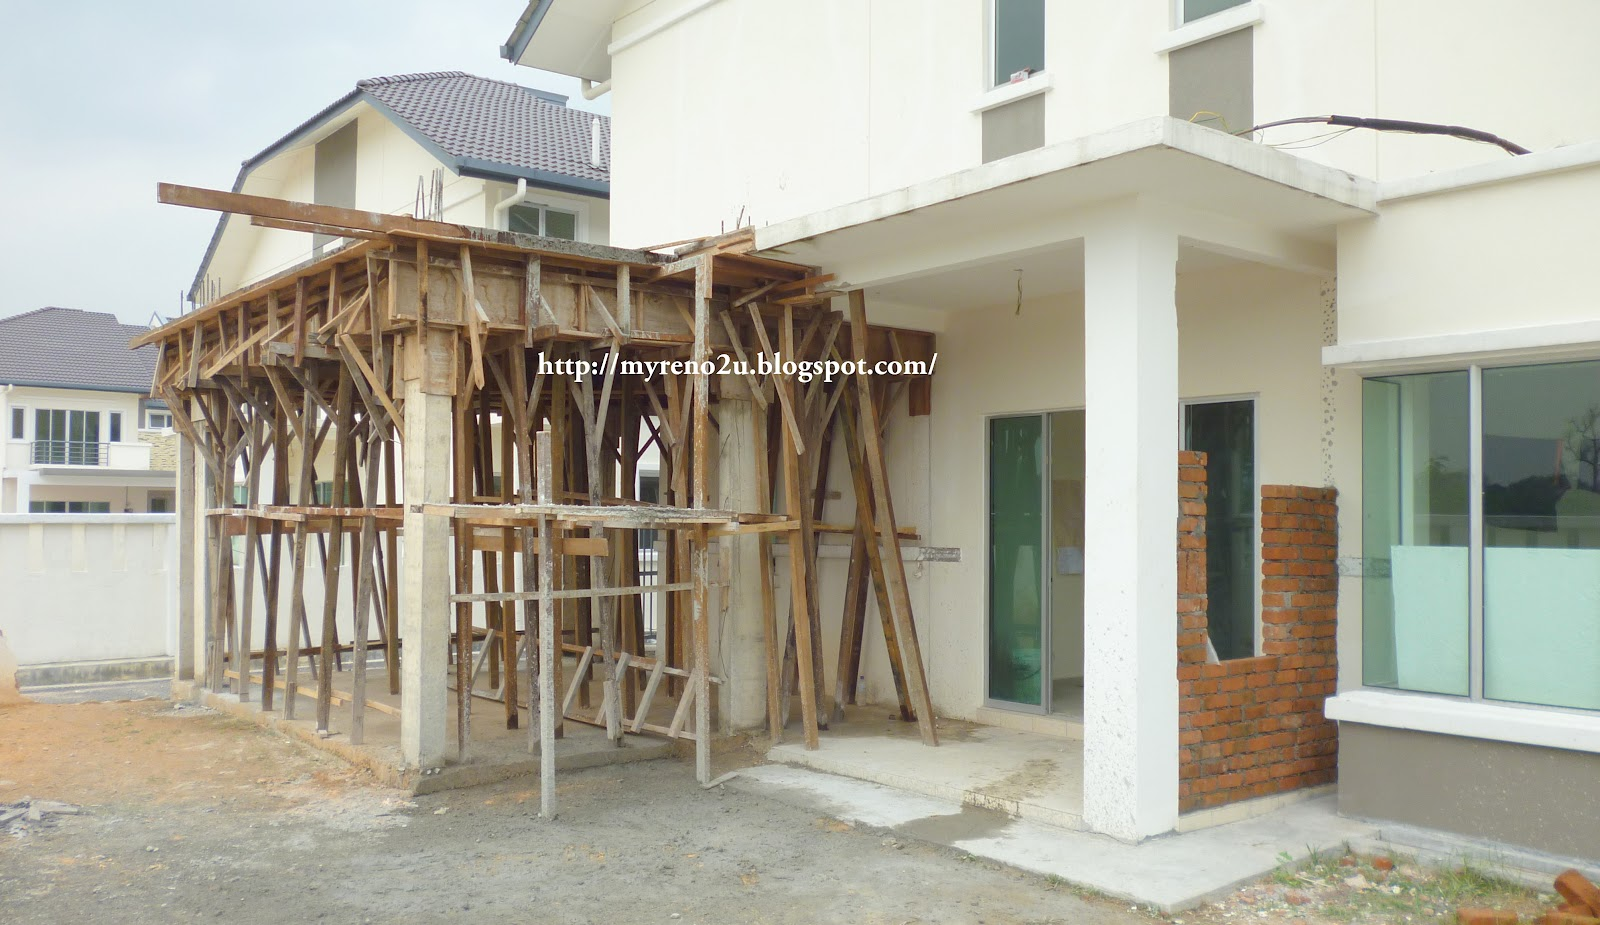 Construction - House Renovation in Kajang | MyReno2U